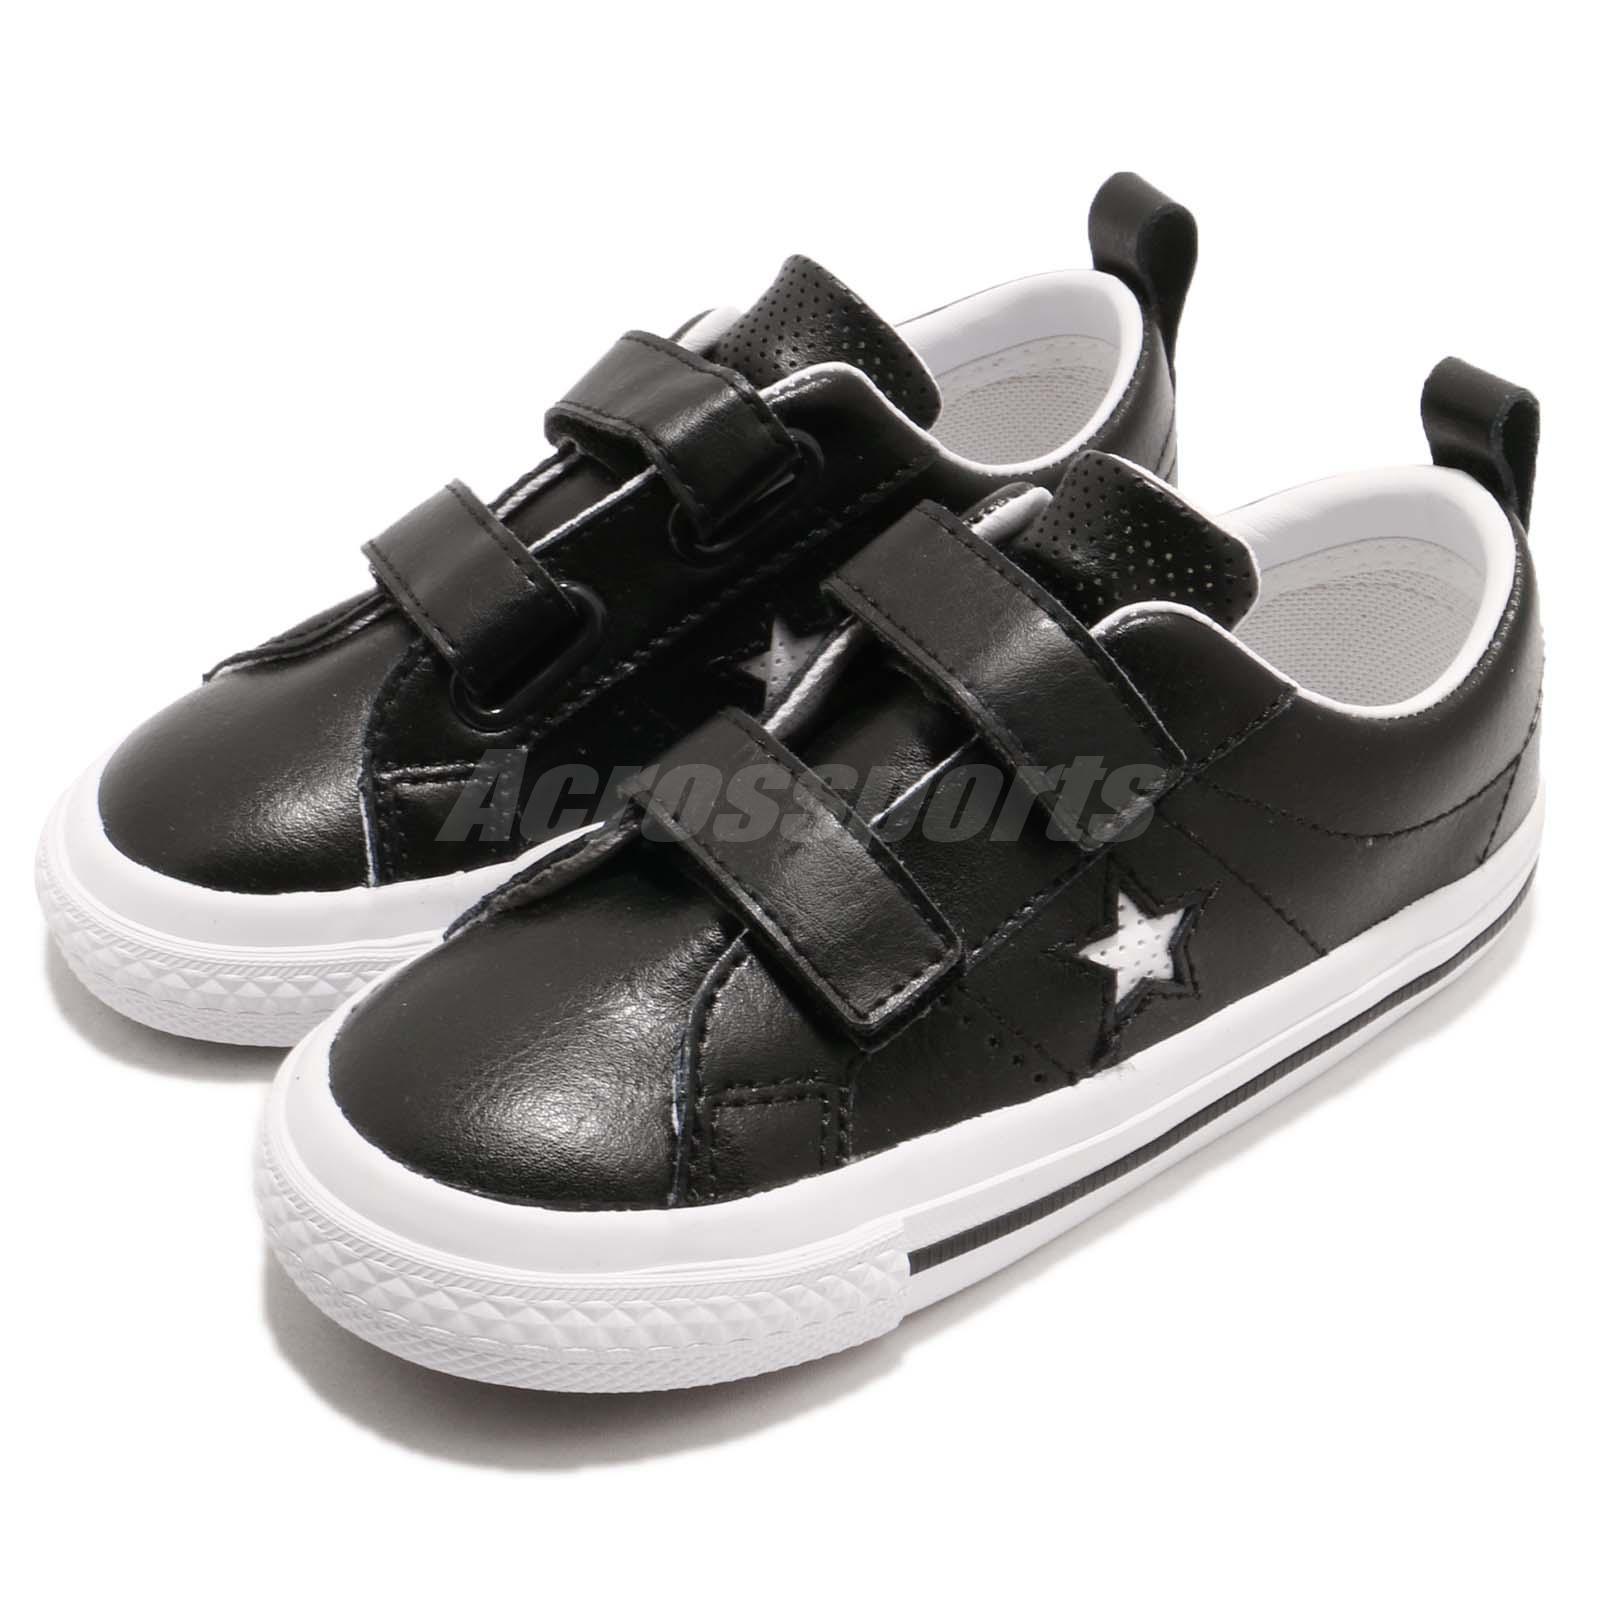 Converse One Star 2v Td Black White Strap Toddler Infant Baby Shoes